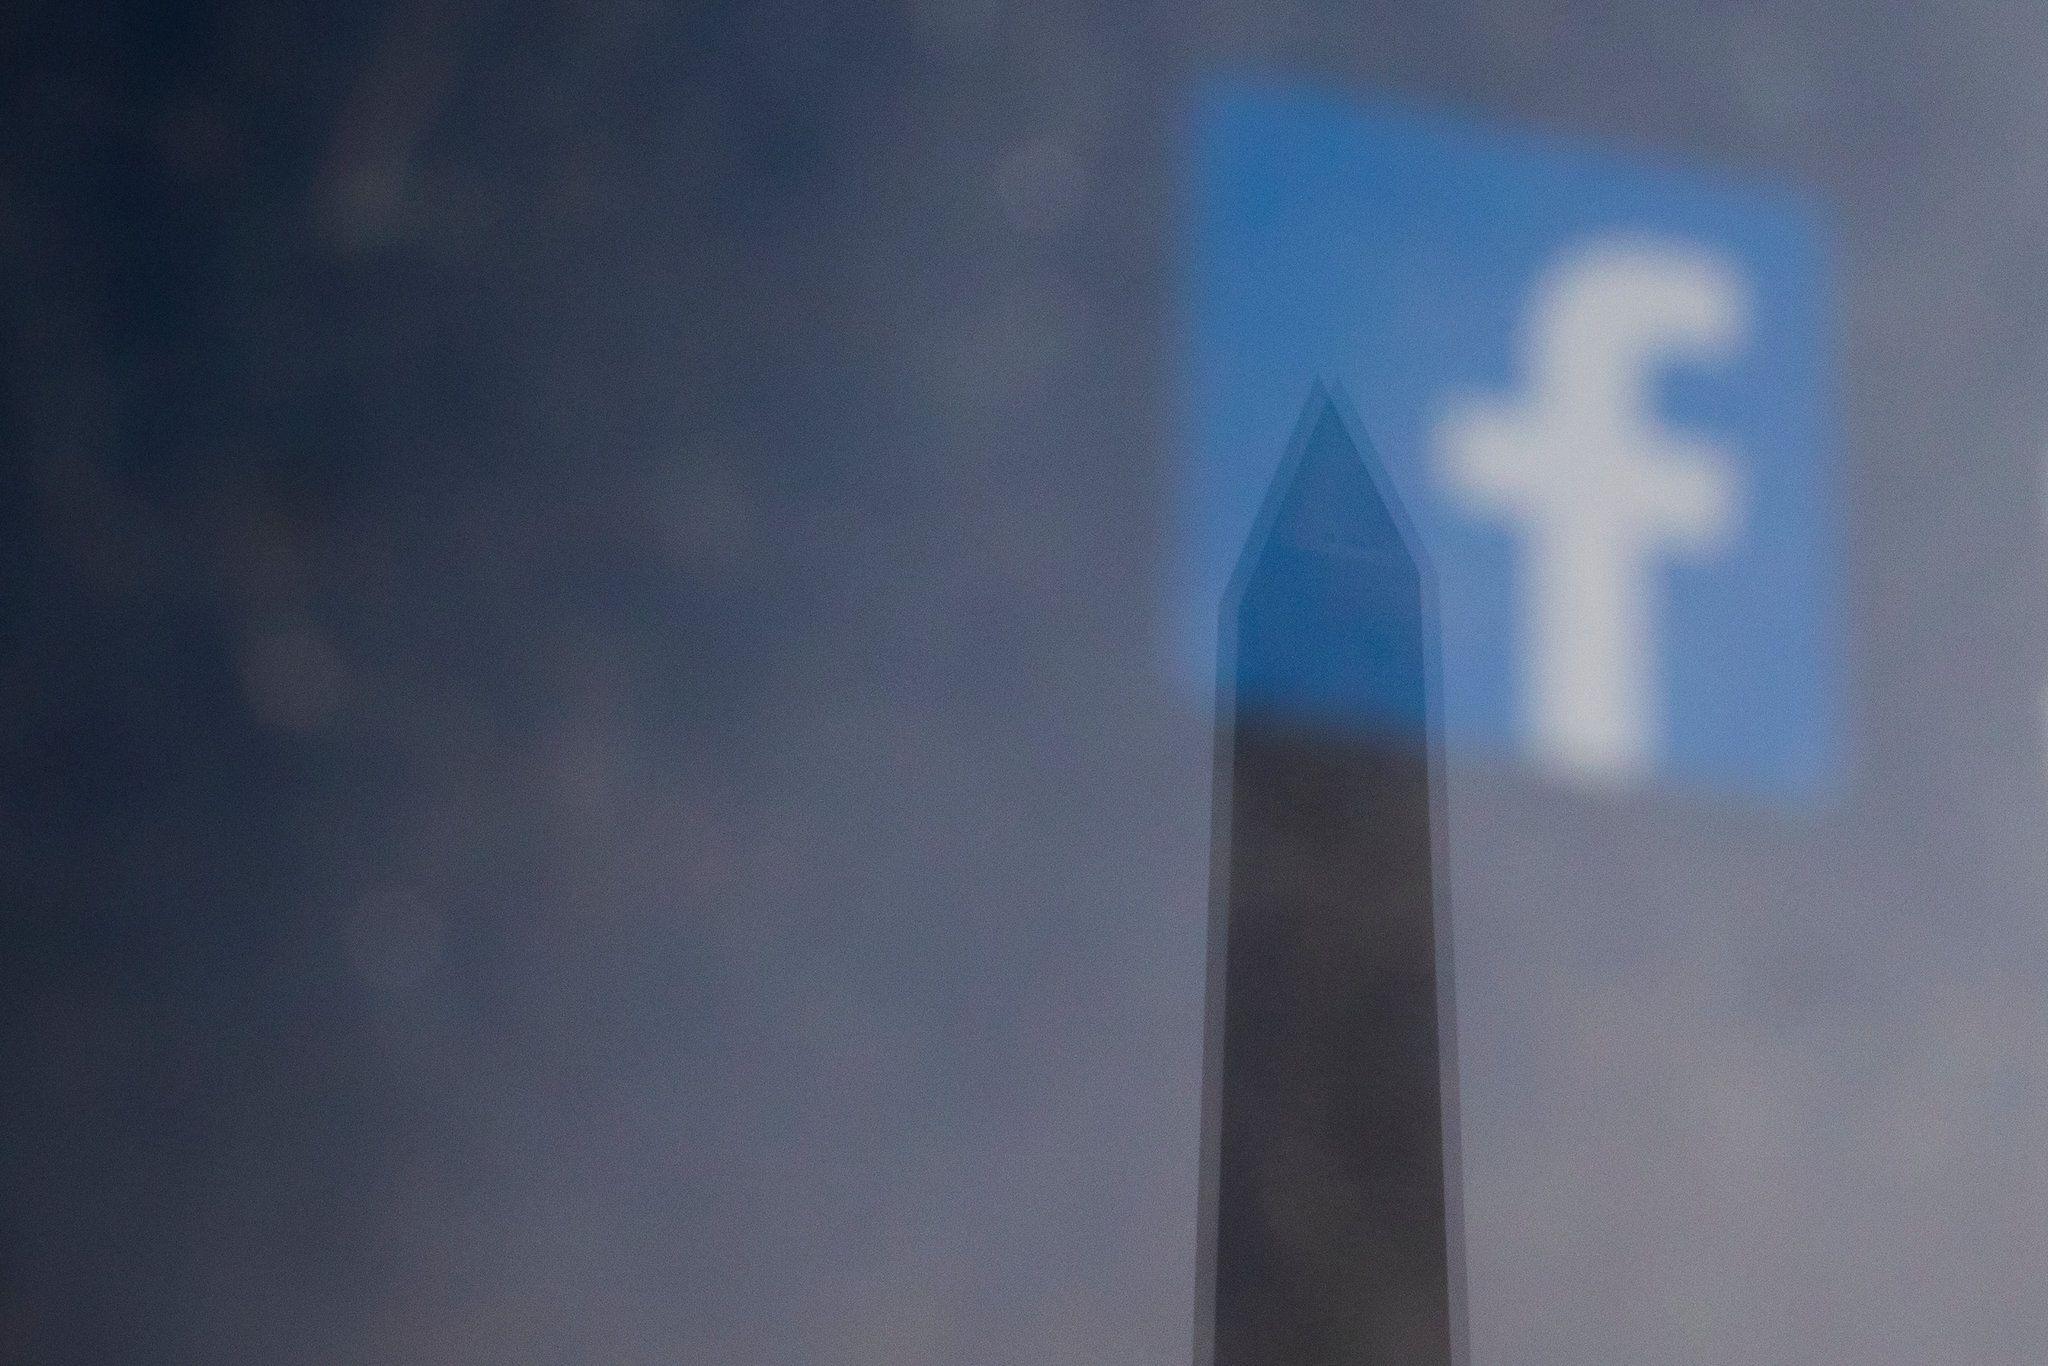 Facebook Antitrust Inquiry Shows Big Tech's Freewheeling